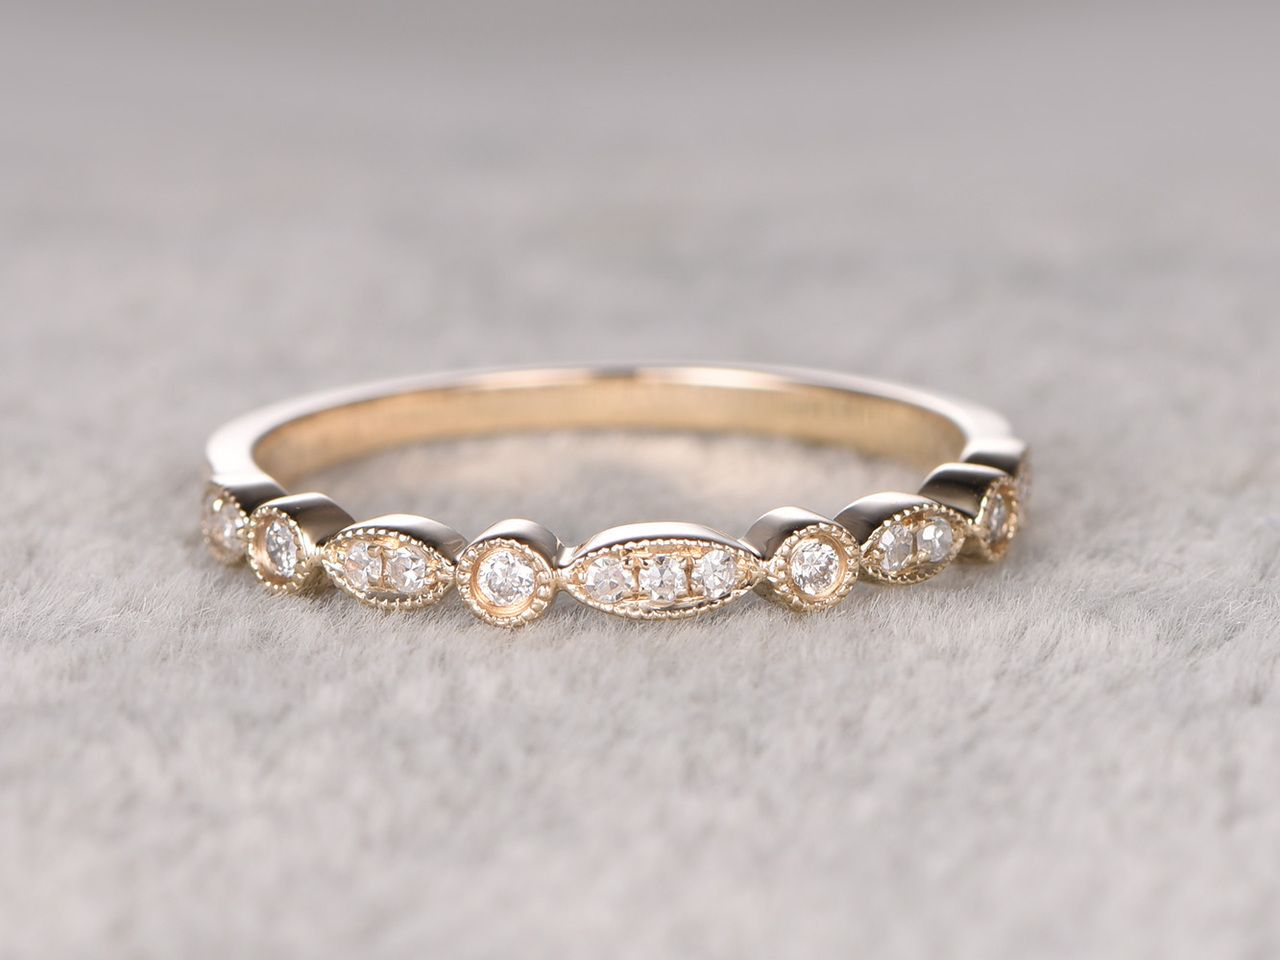 Brilliant Bijou 14k 1.5mm Milgrain Mens Womens Wedding Anniversary Band Finger